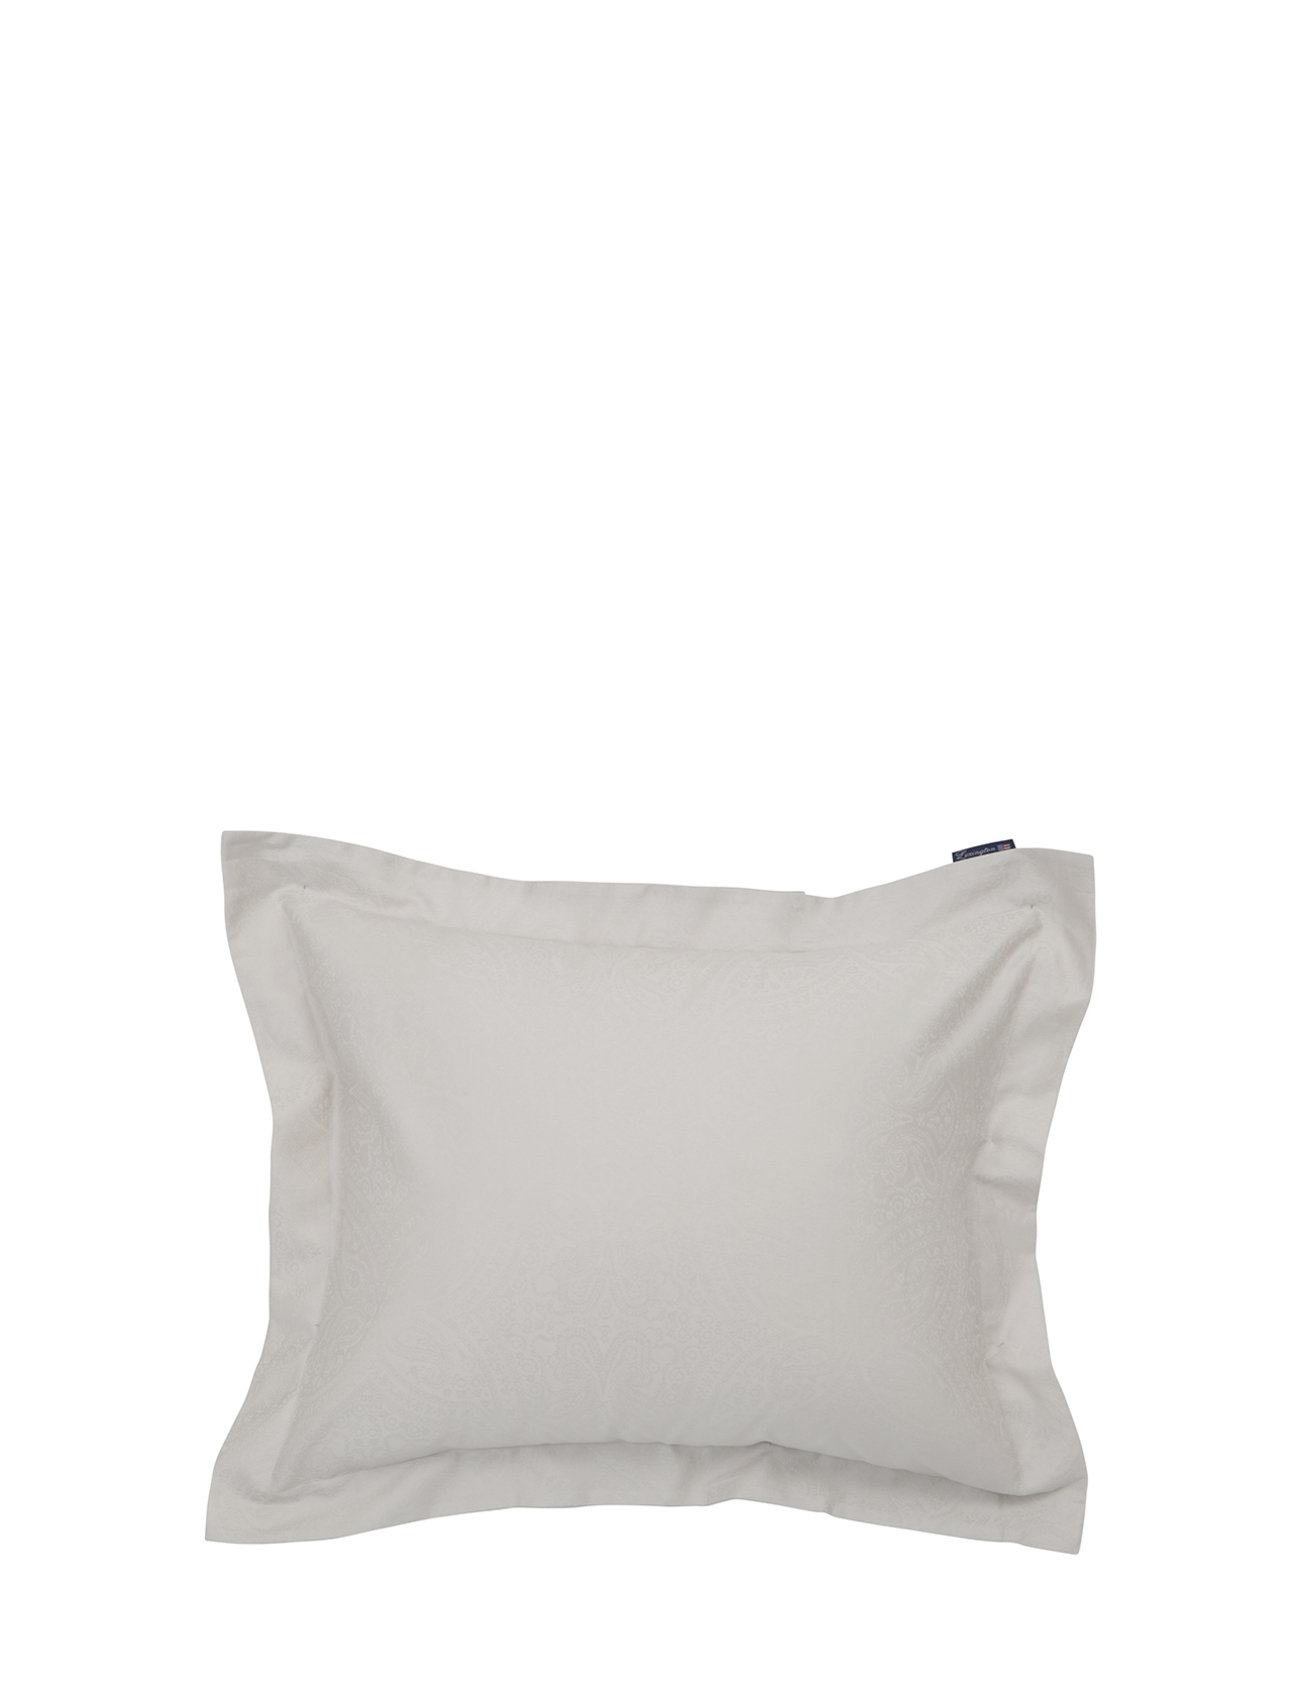 Lexington Home Hotel Sateen Jacquard Lt Beige Pillowcase - LT BEIGE